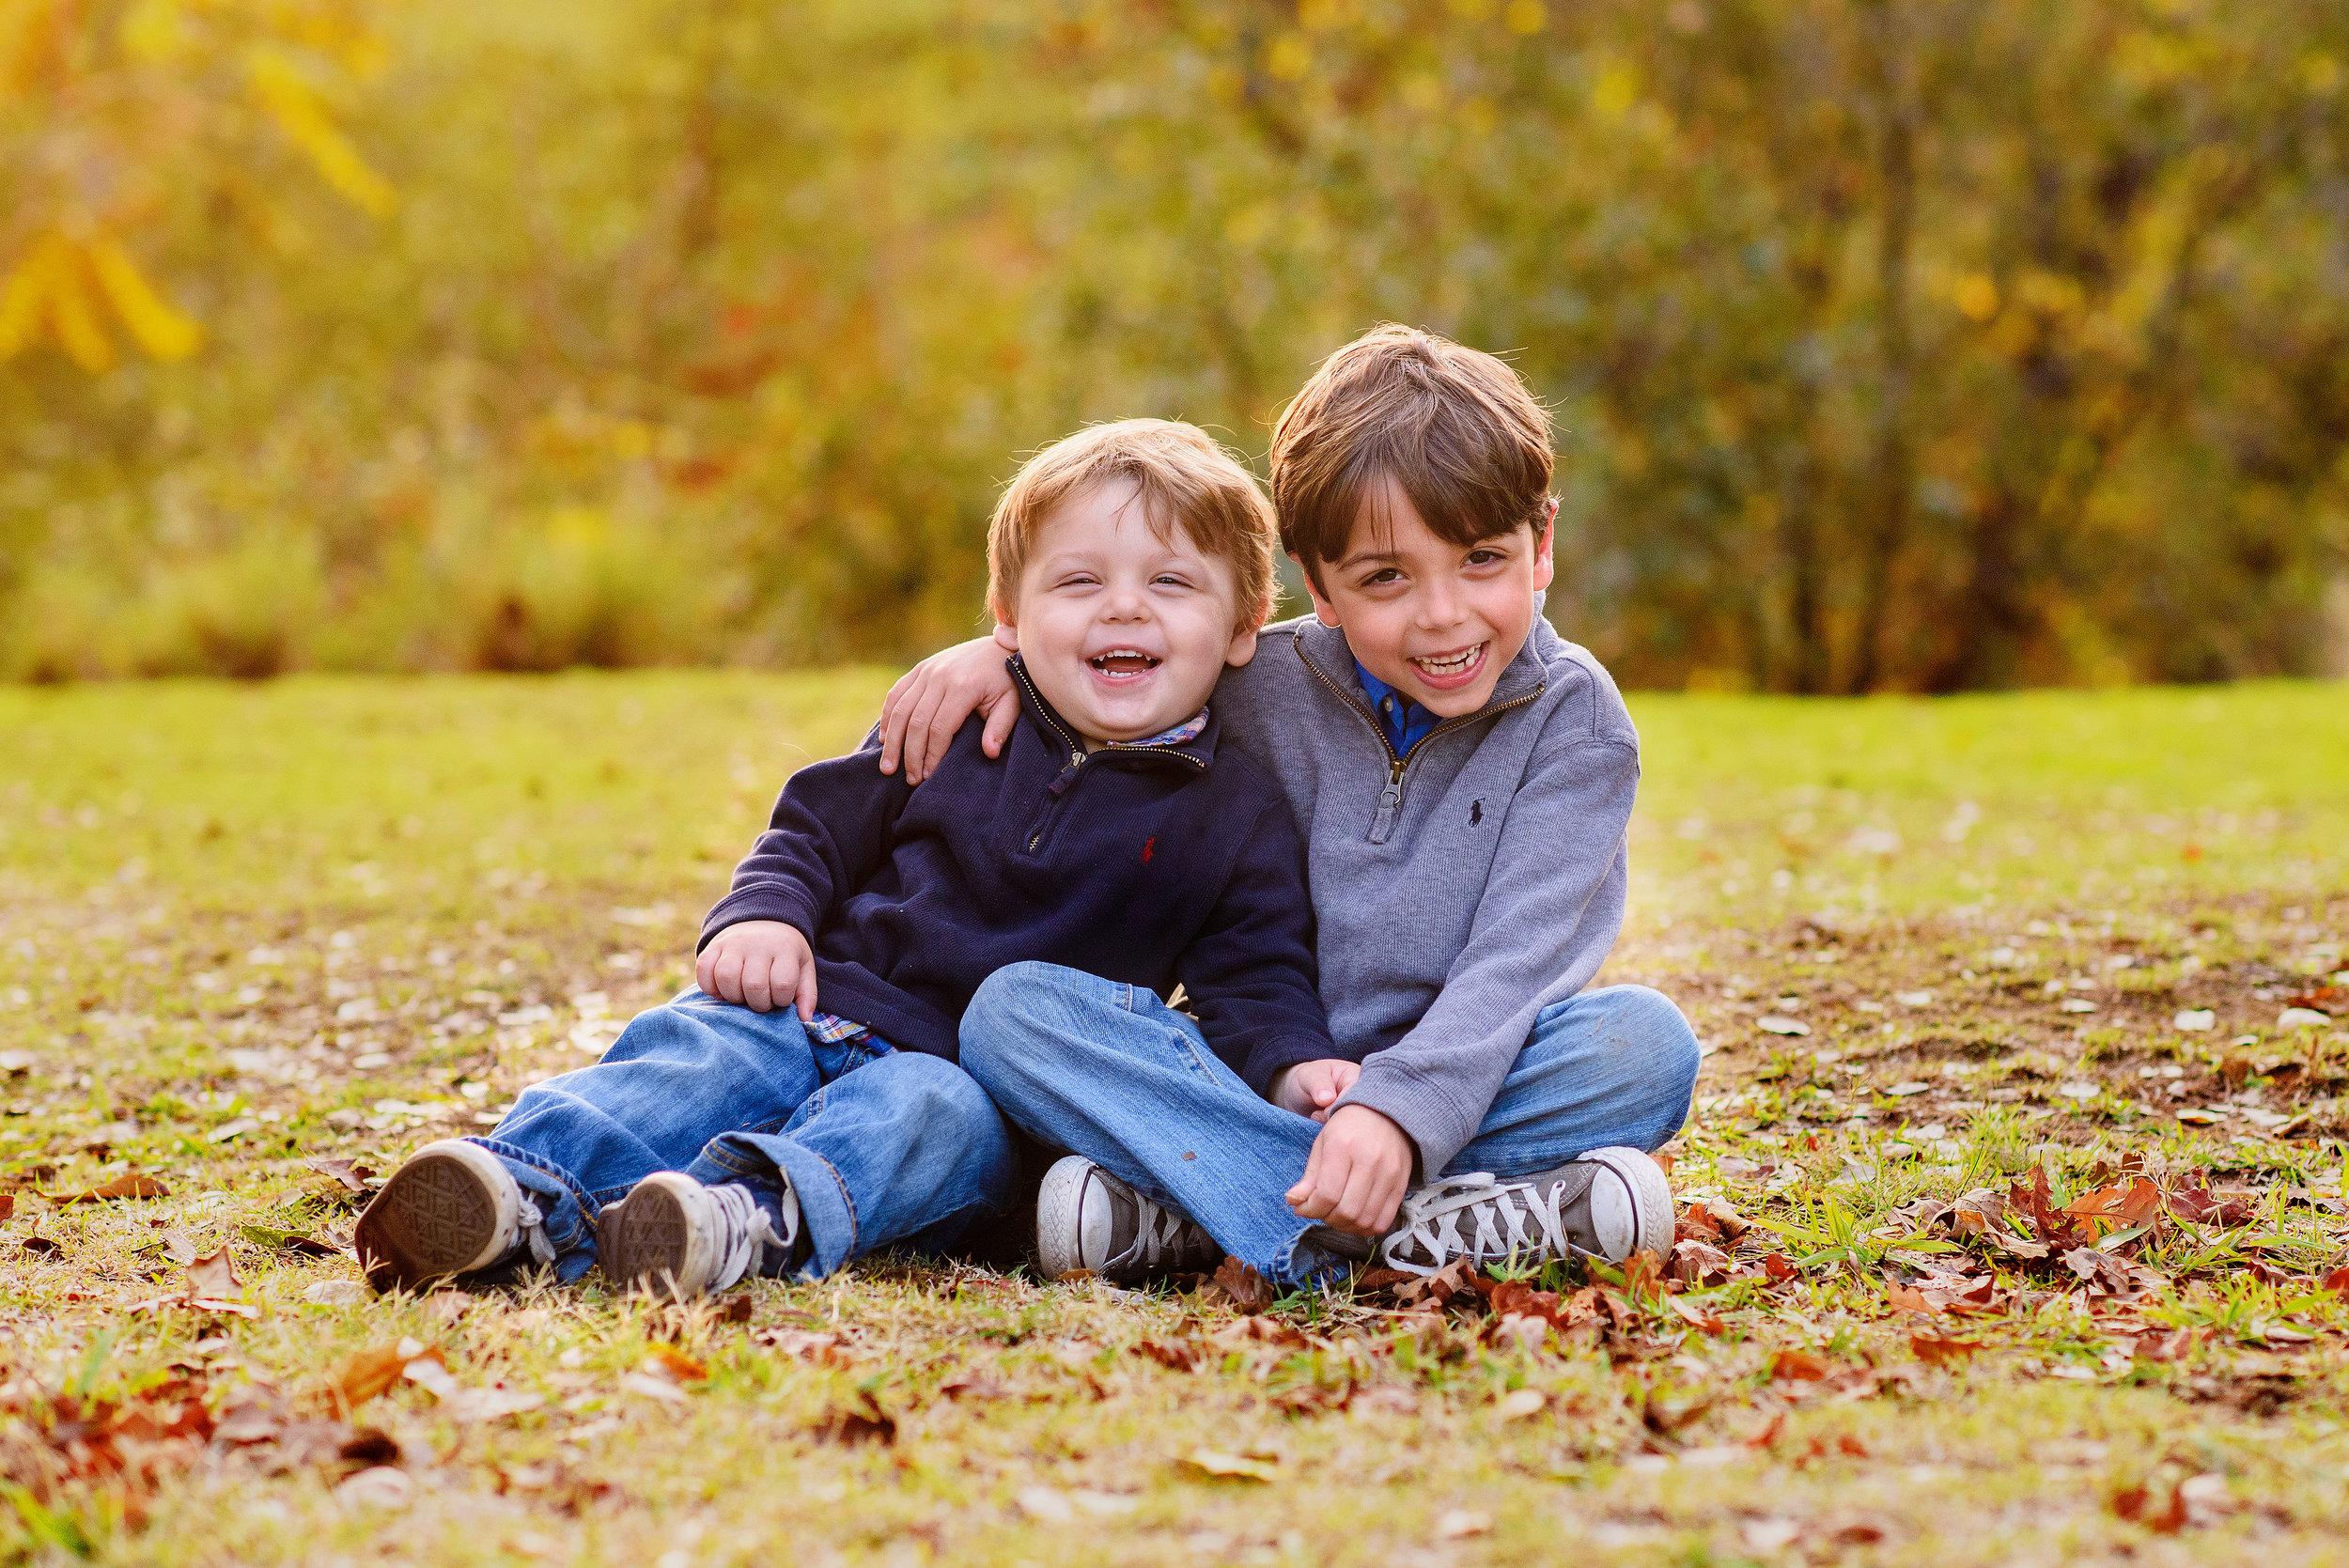 chapman-family-006-sacramento-family-photographer-katherine-nicole-photography.JPG